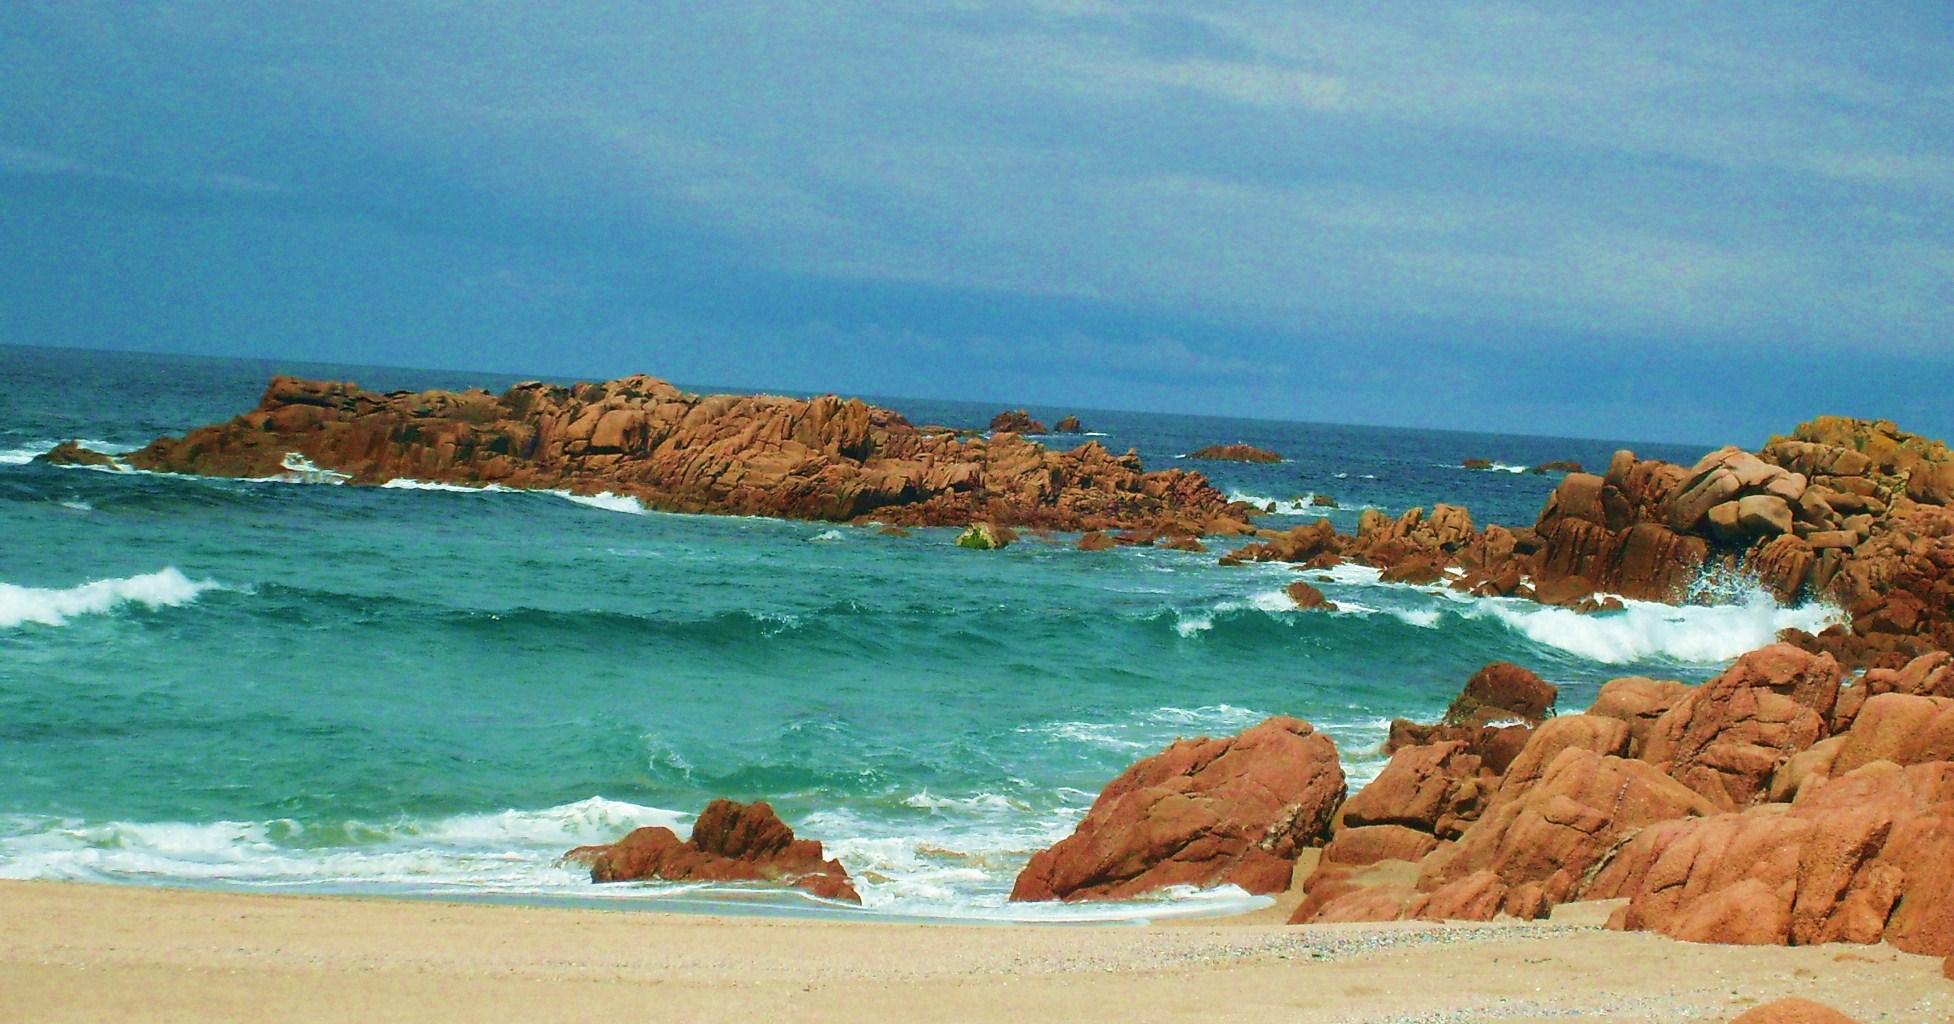 Foto playa Area Longa / Area Grande. Aguas turquesas en la playa